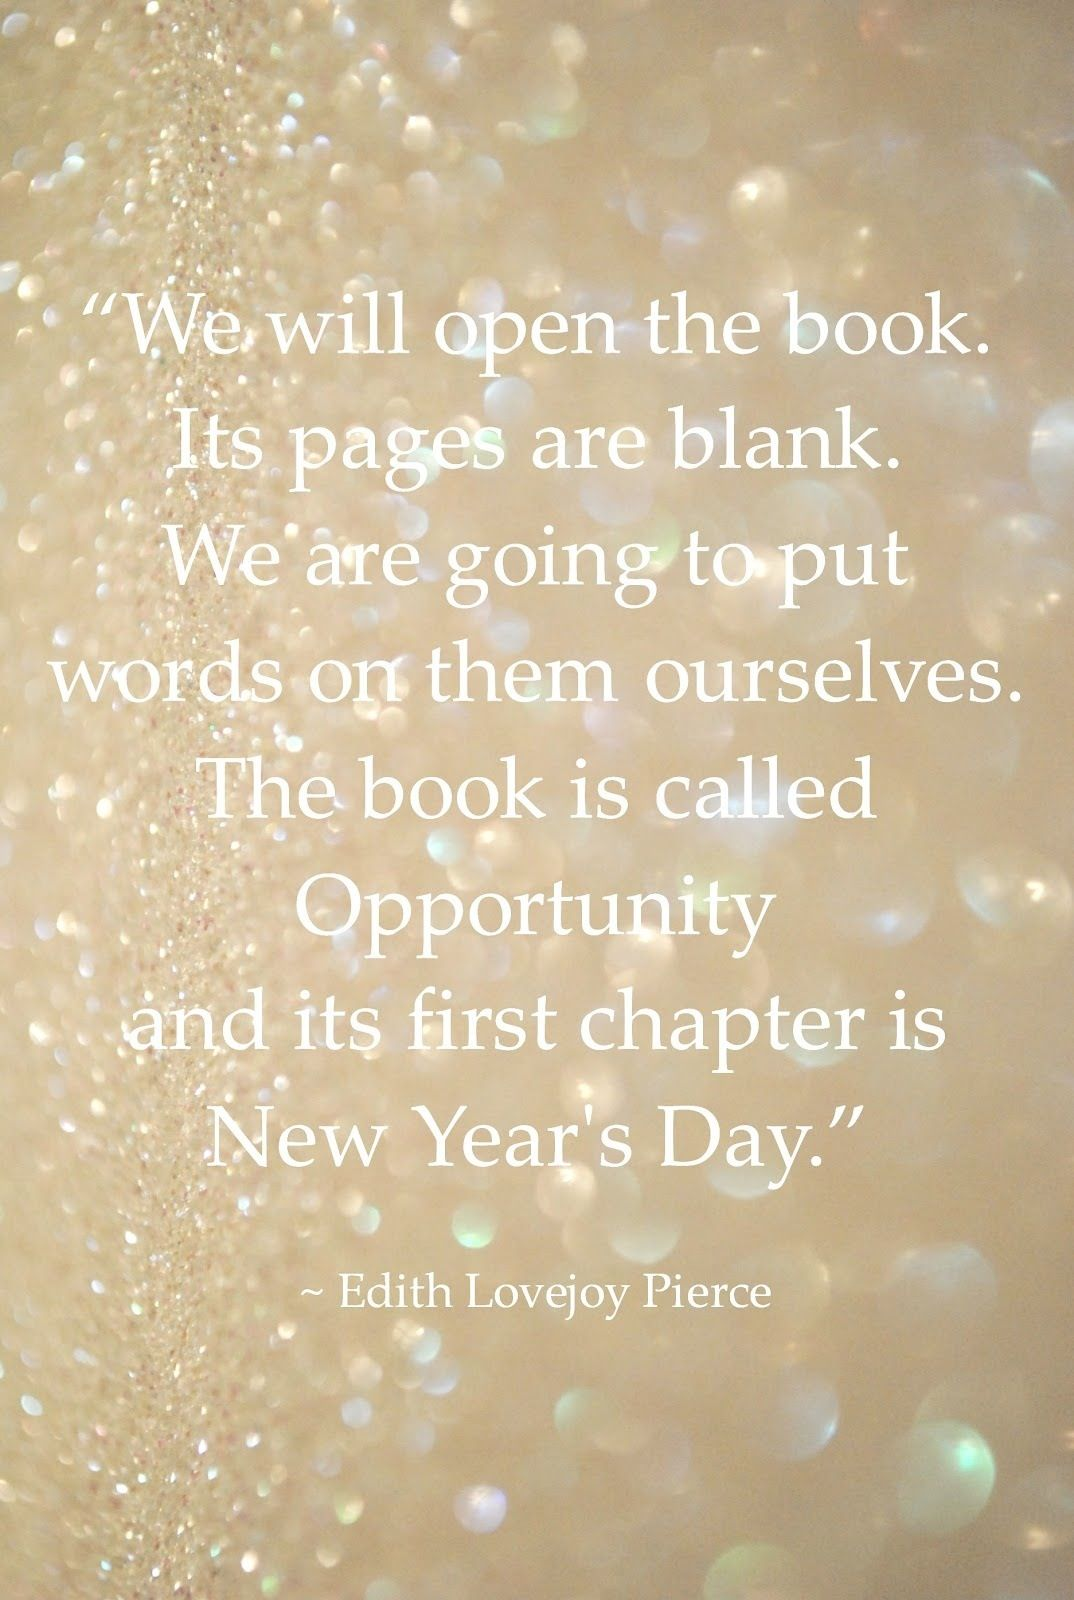 Happy New Year, friends. | A New Year | Pinterest | Wisdom ...